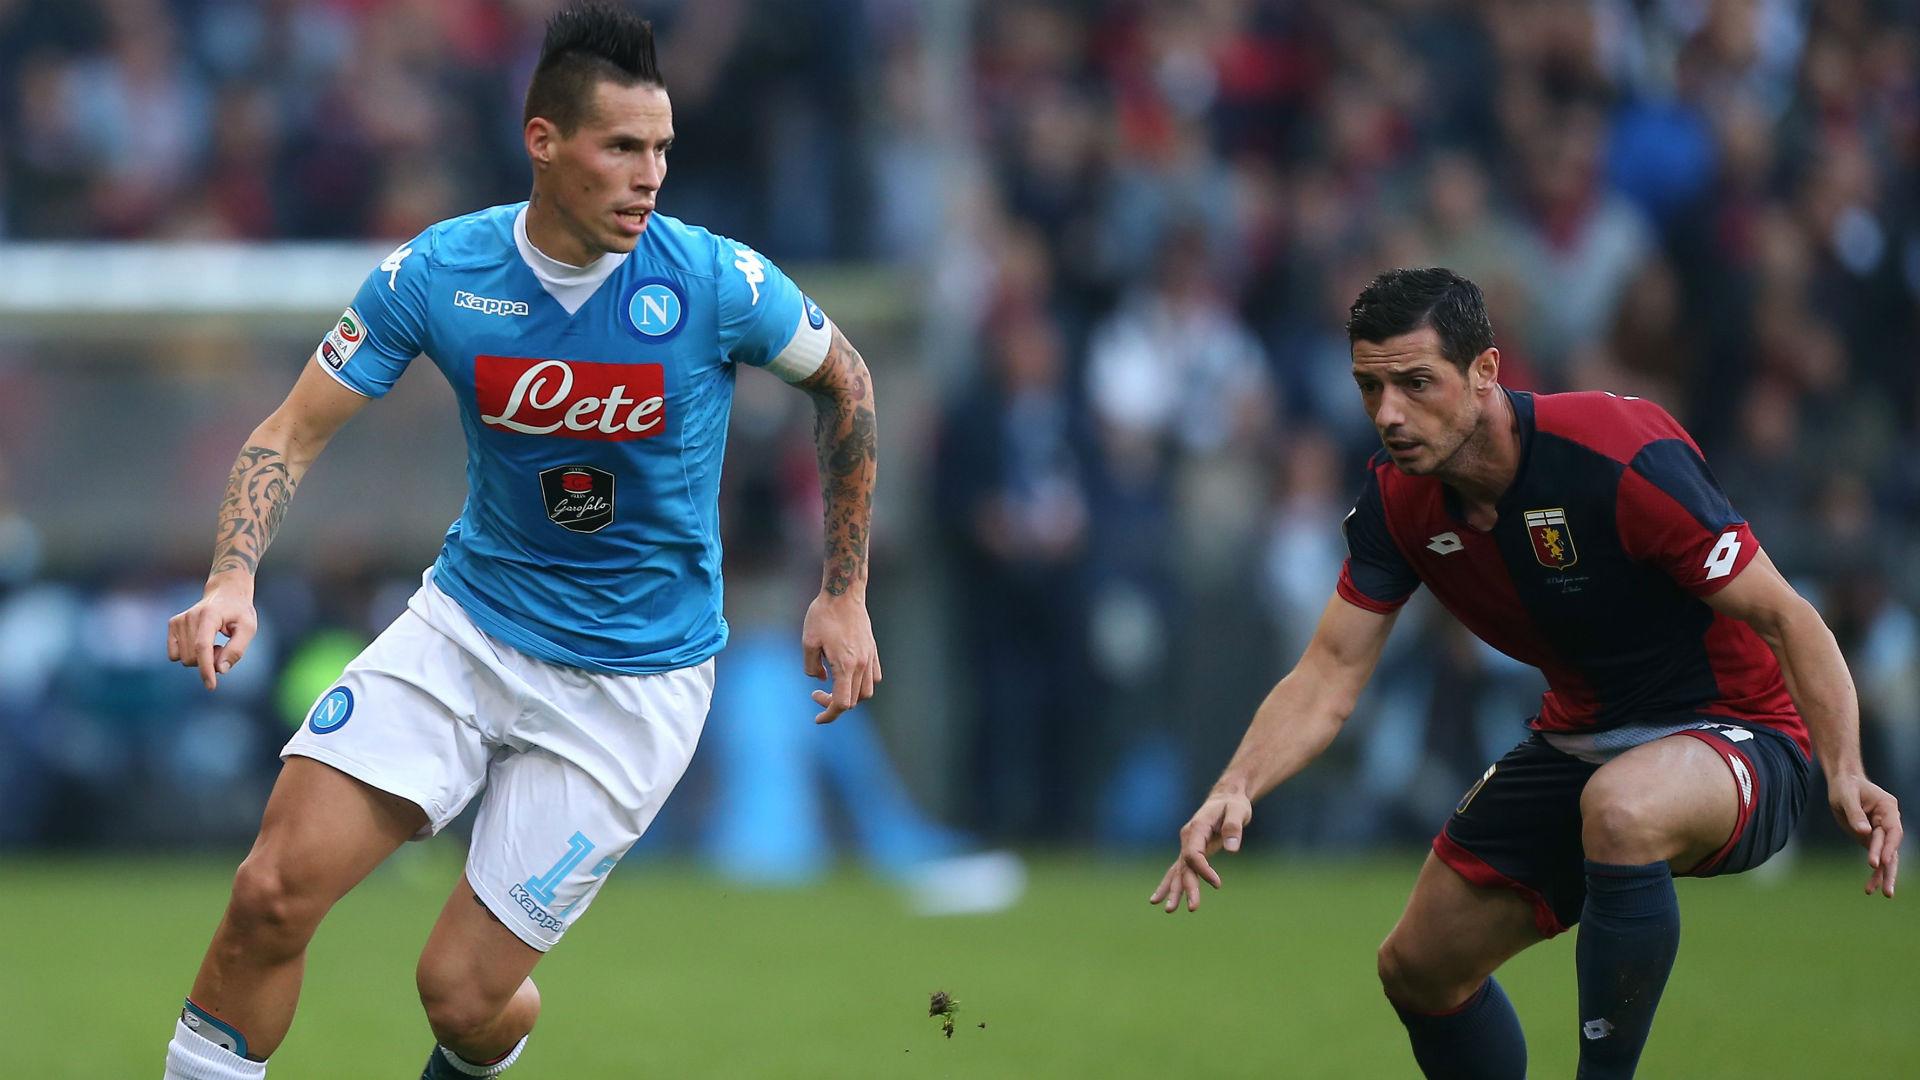 Video: Genoa vs Napoli